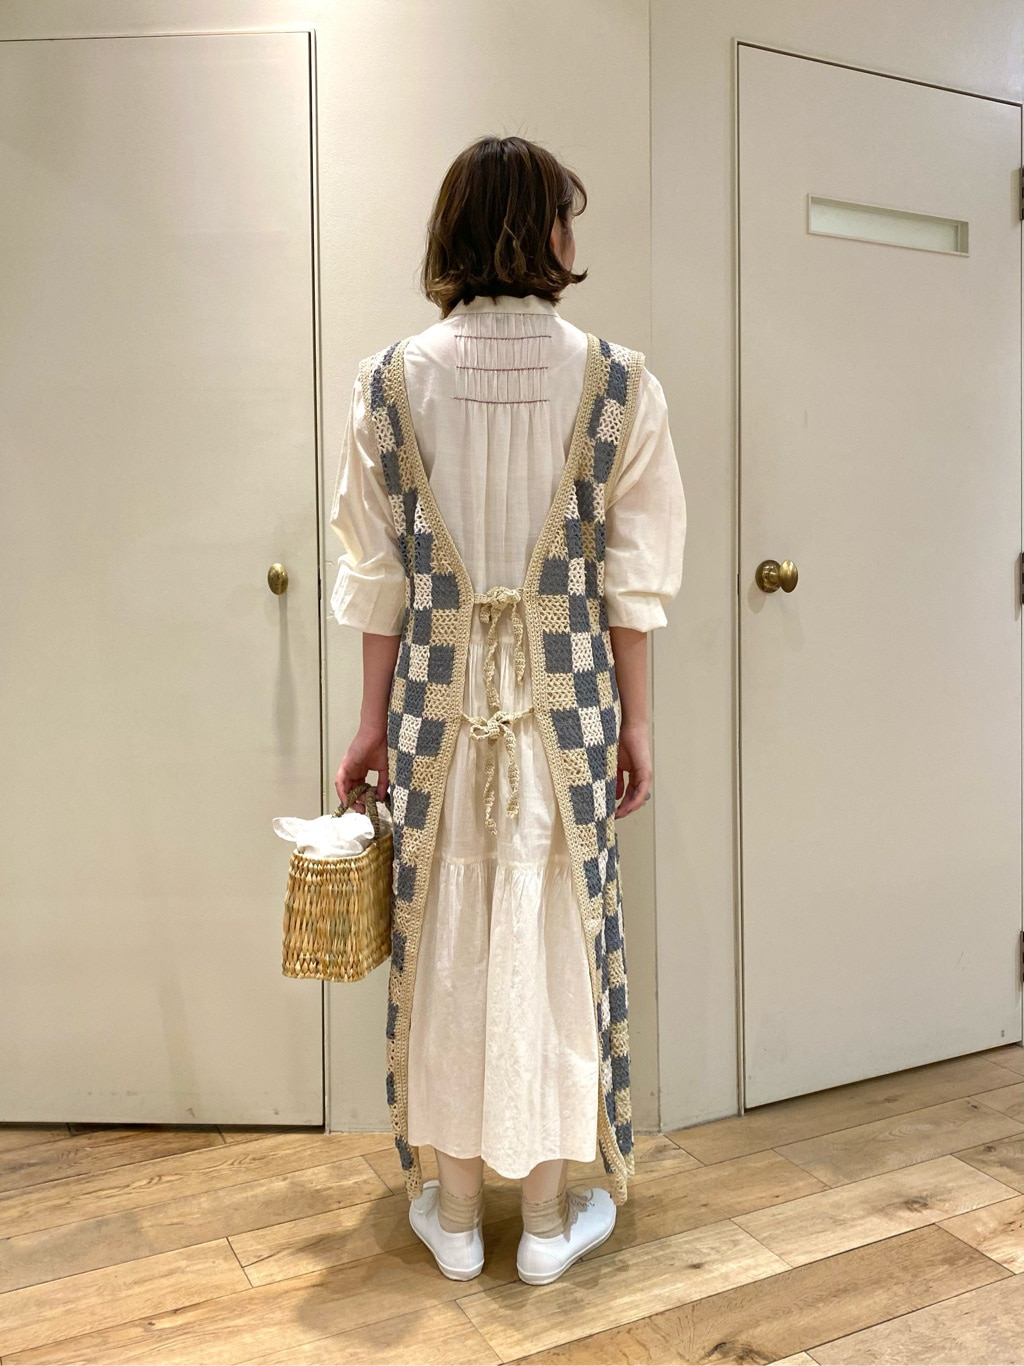 bulle de savon 新宿ミロード 身長:157cm 2021.03.31